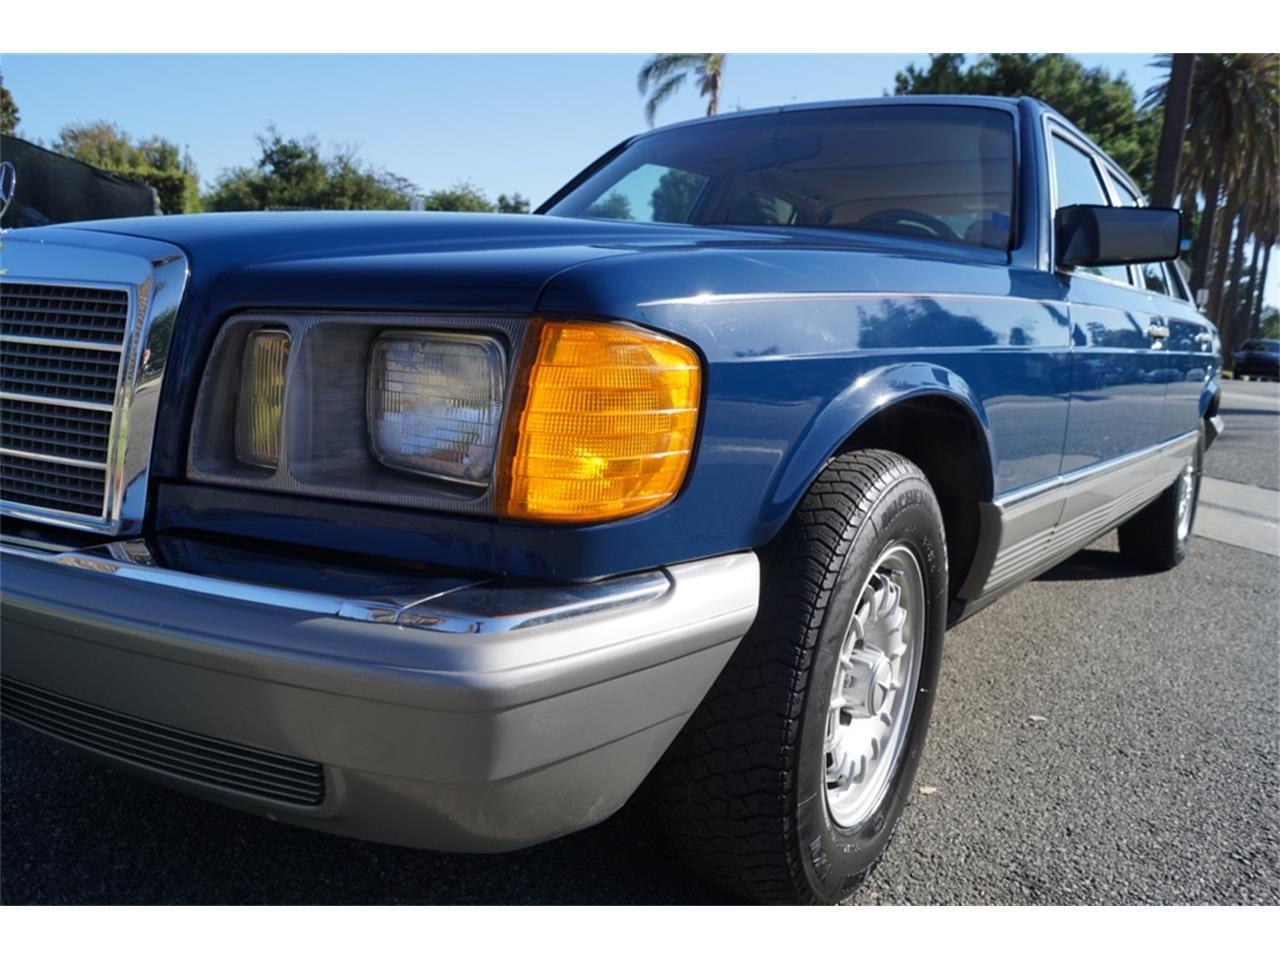 1985 Mercedes-Benz 300SD Turbo Diesel for Sale   ClassicCars.com   CC-919337